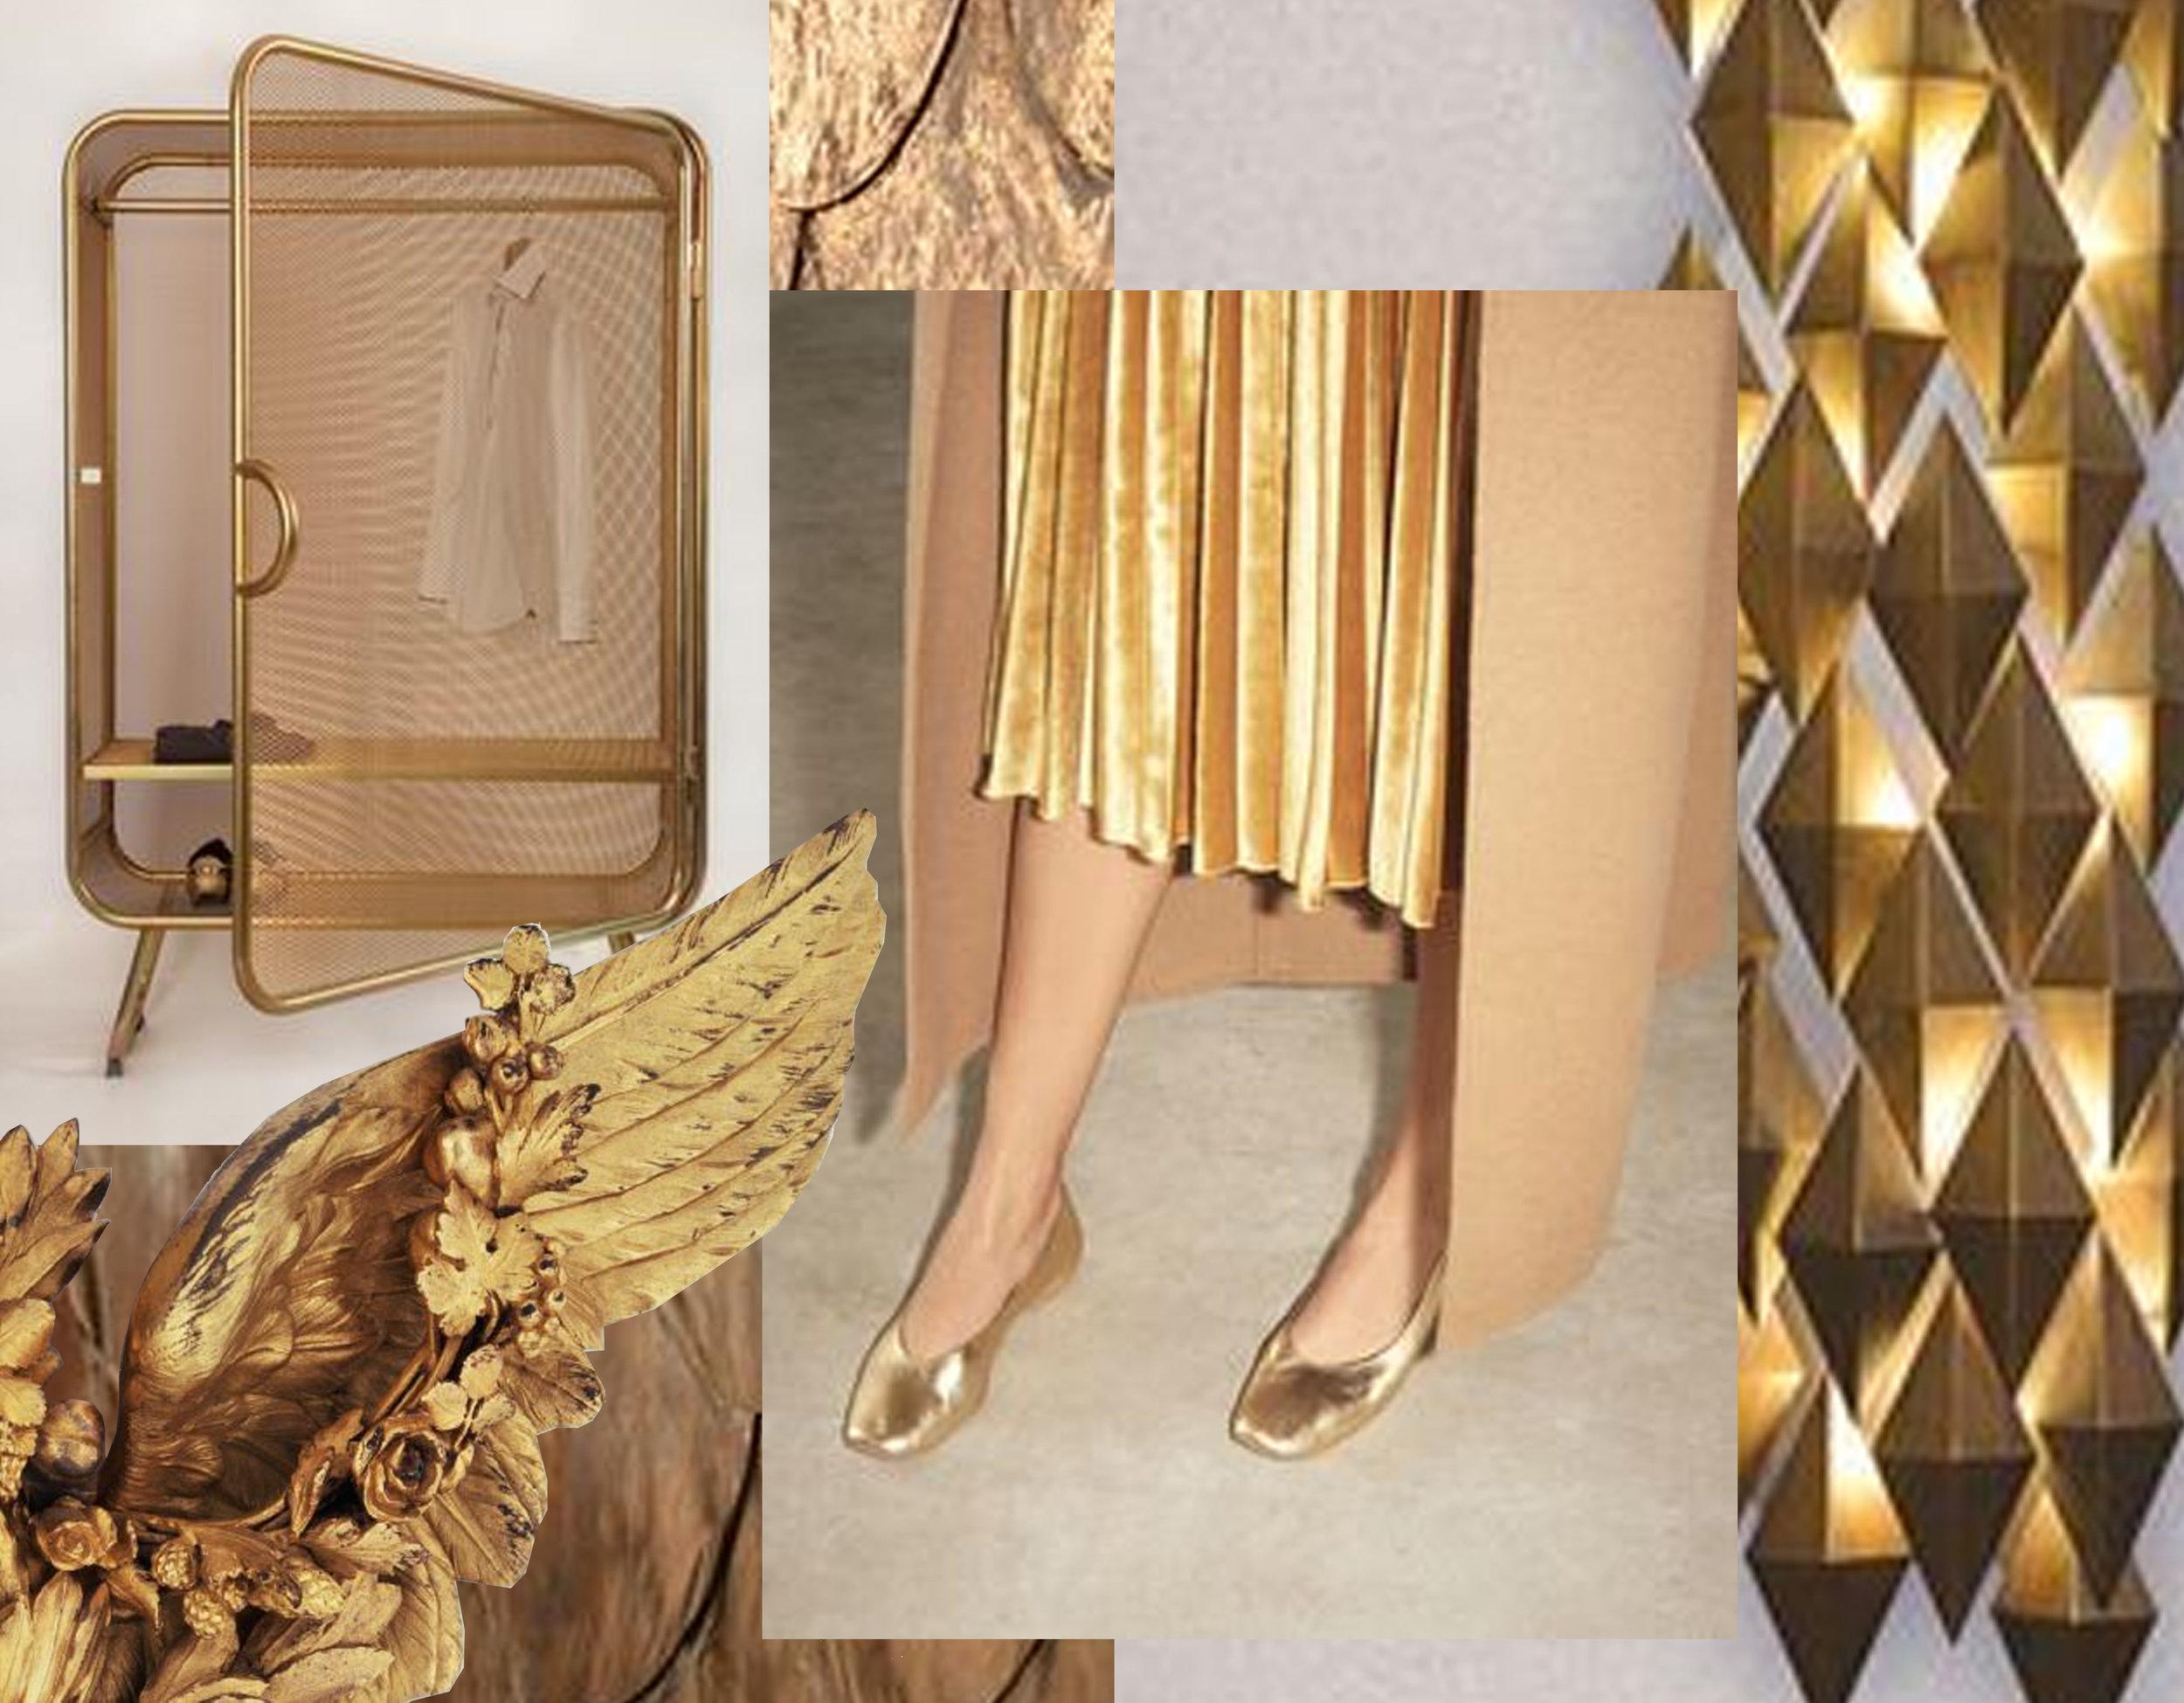 closet via  Eget Rom  - angel wing  Pinterest  - draped outfit  Pinterest  - Daria scone  Lusive